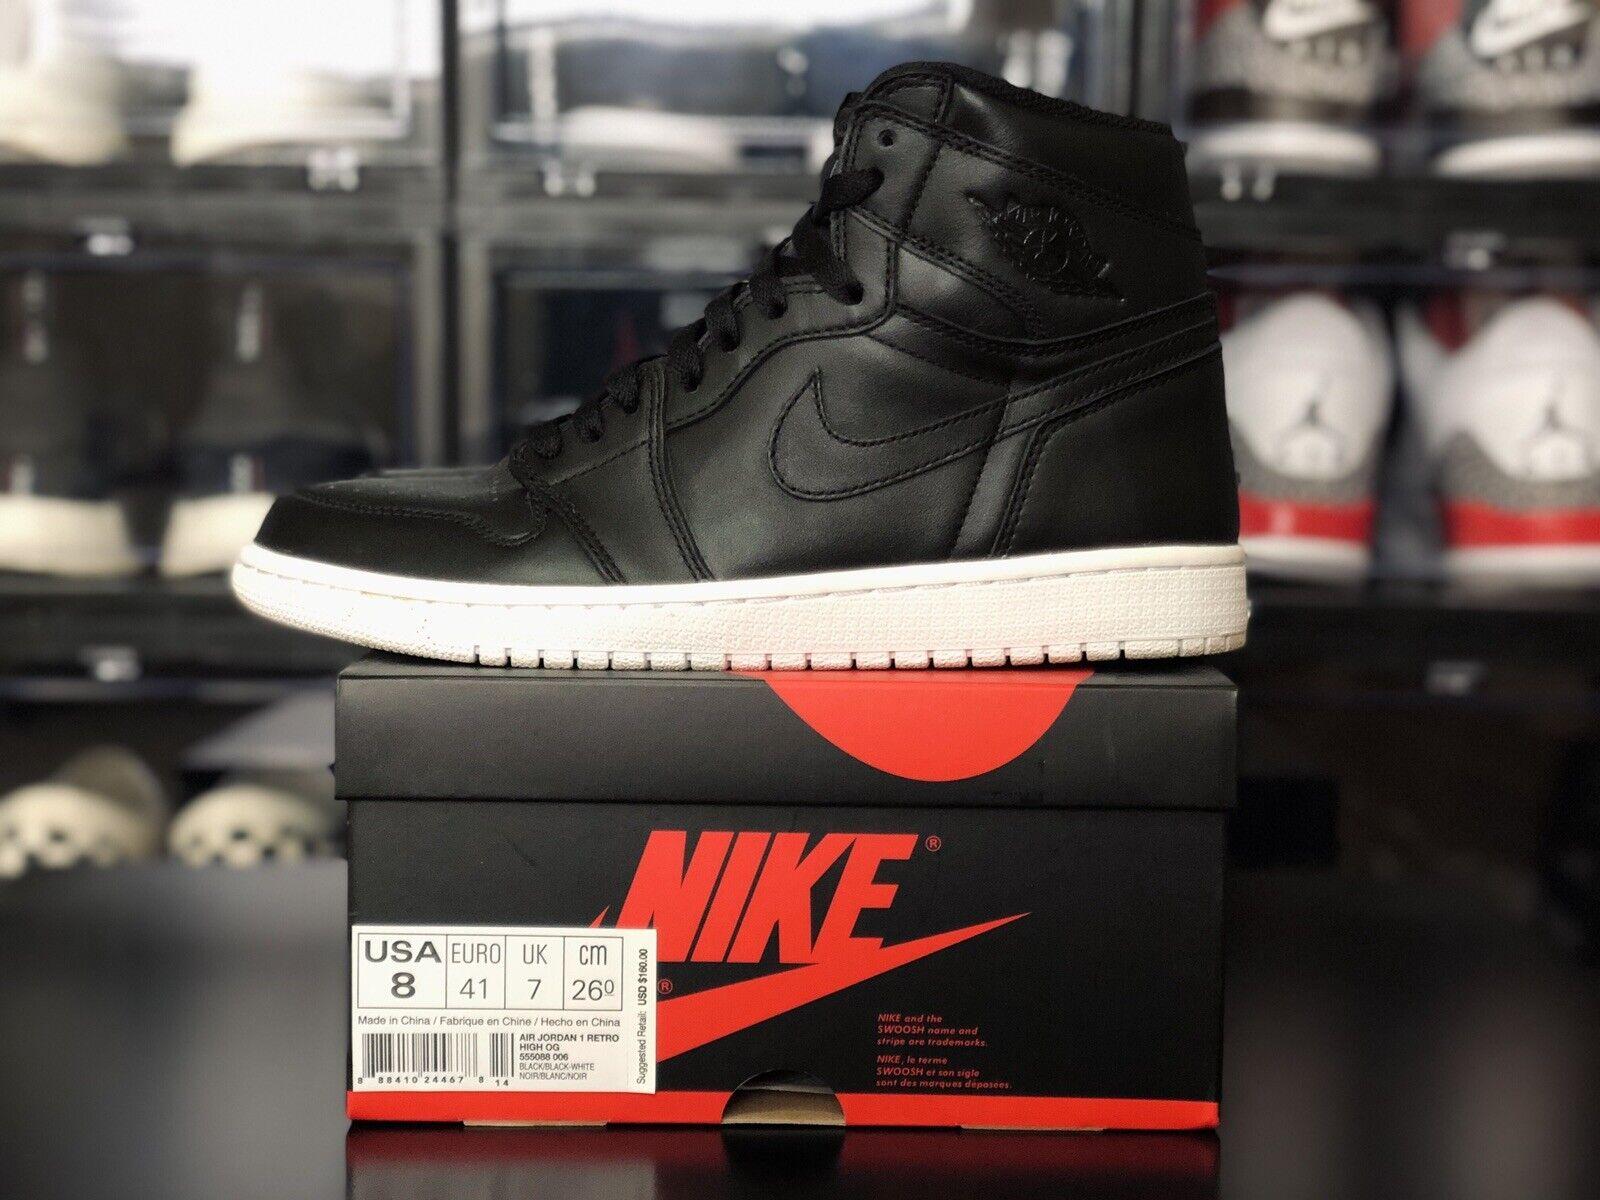 Jordan 1 Retro OG Cyber Monday Size 8 Black White 555088-006 nike supreme mj